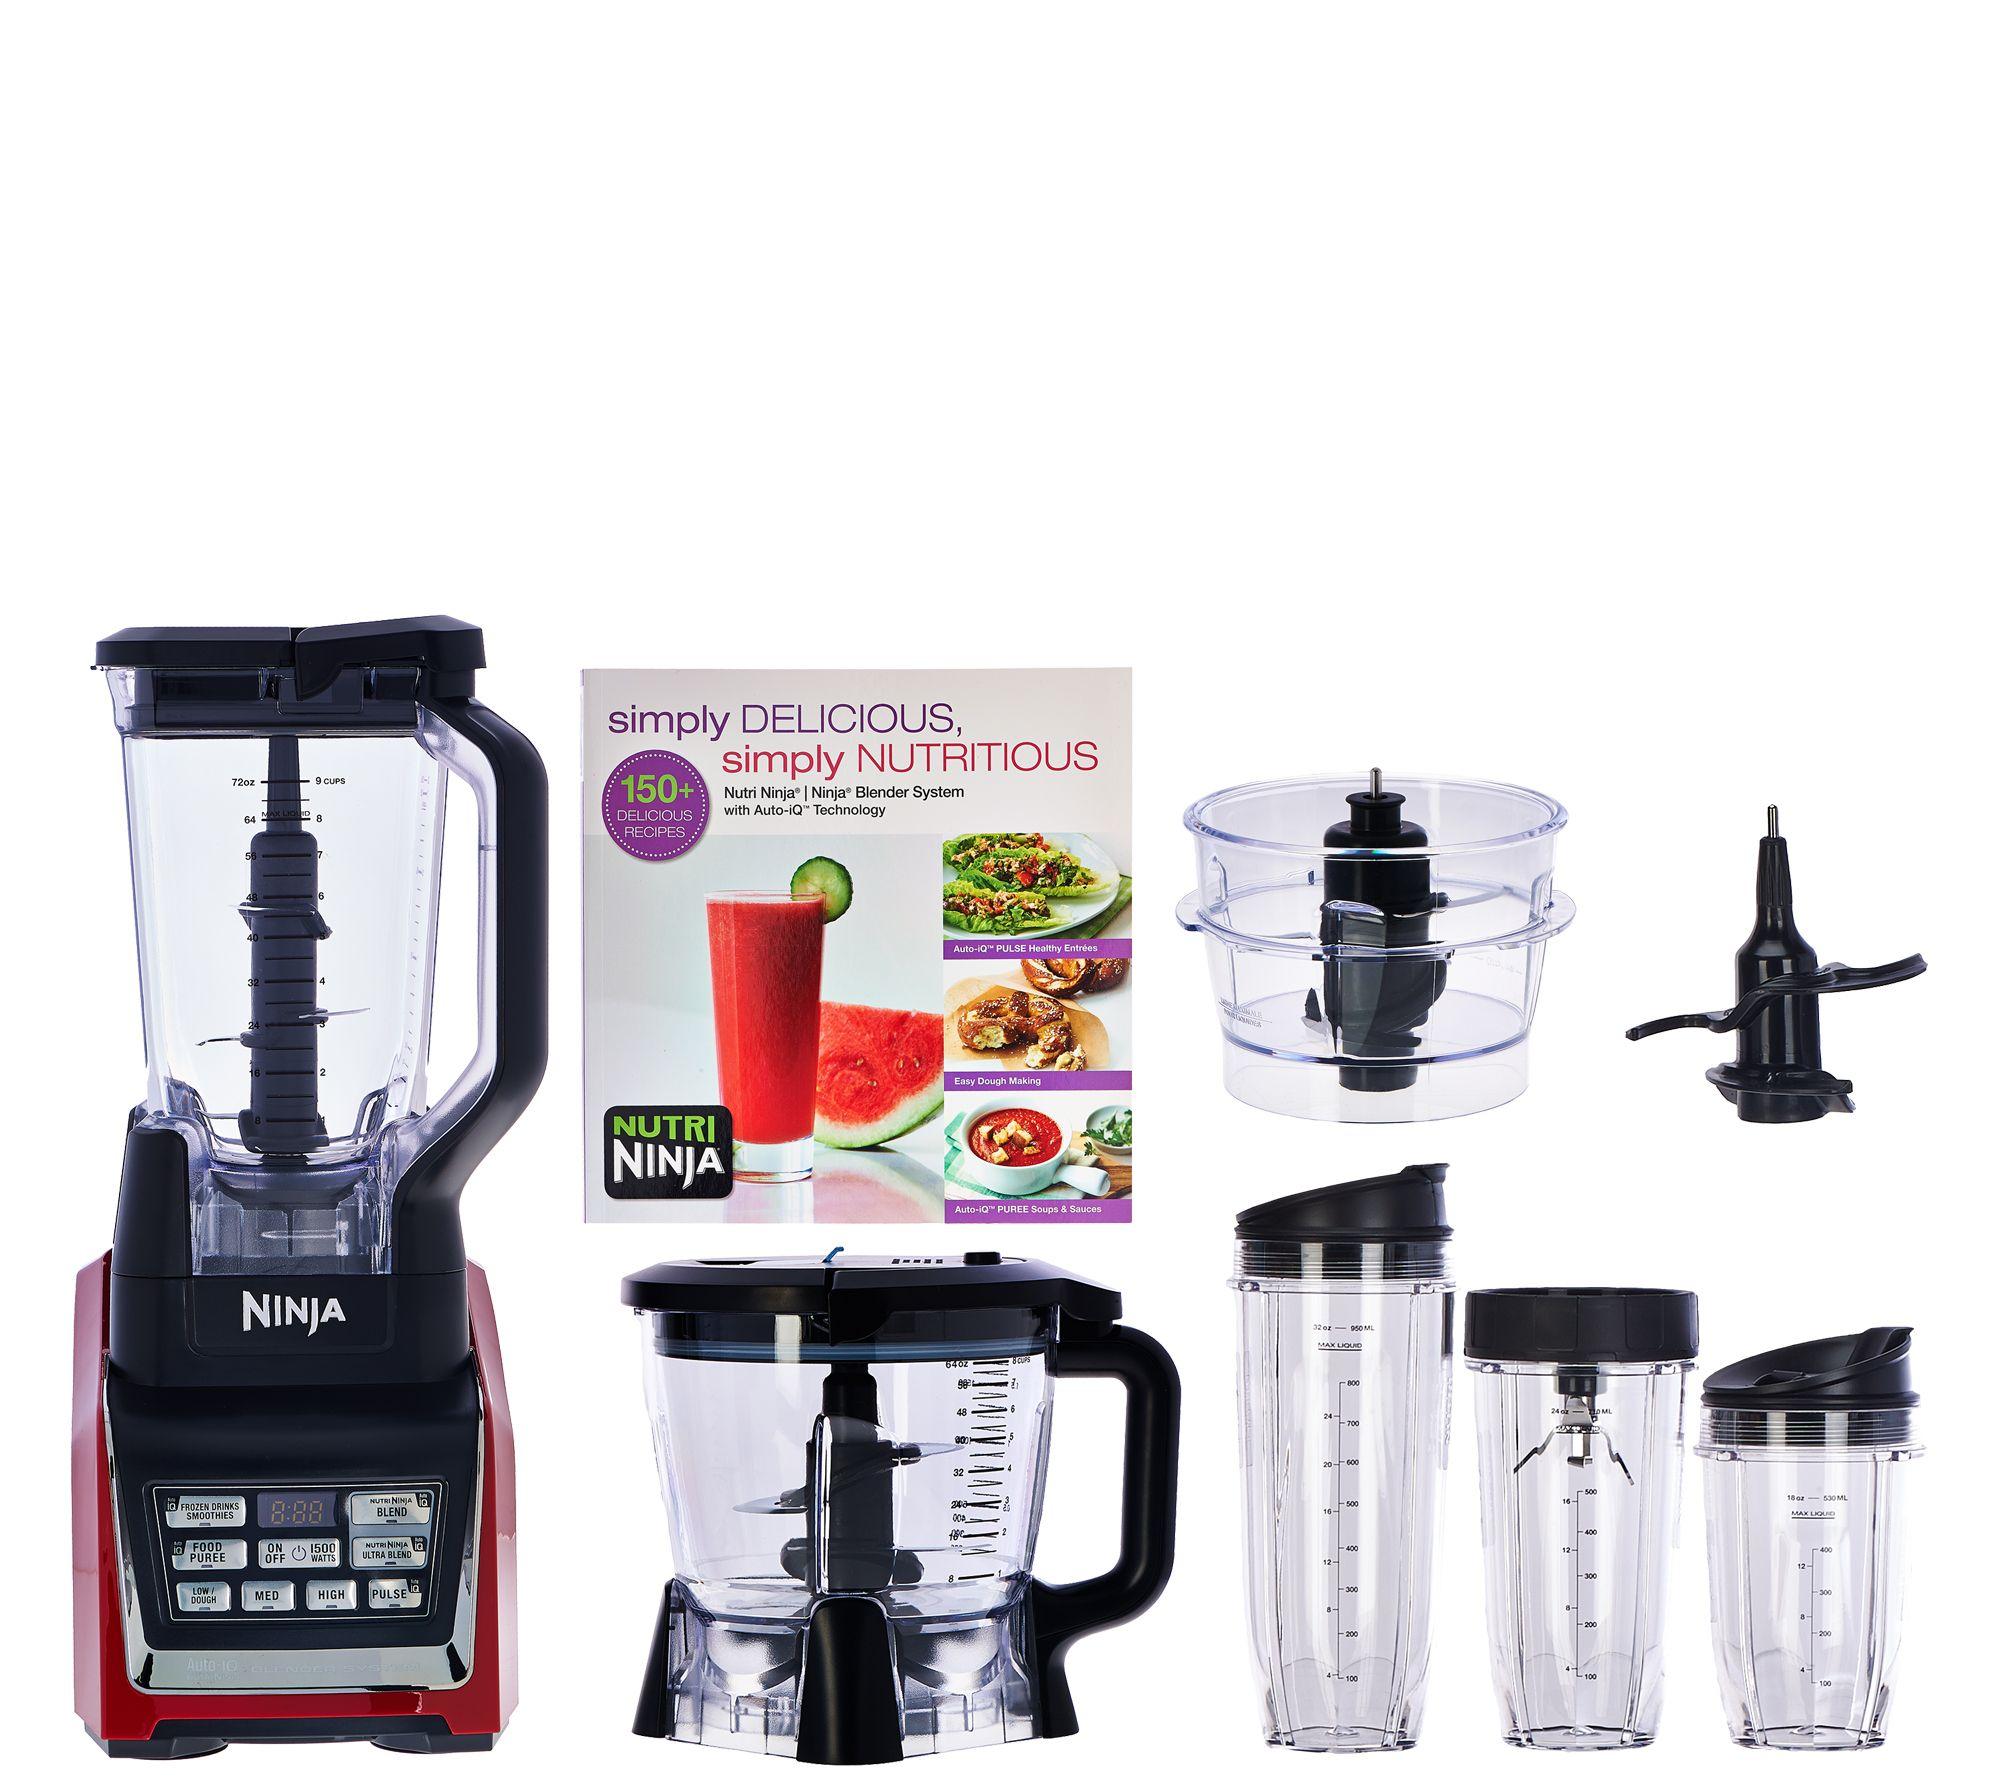 ninja mega kitchen 1500 fluorescent lighting nutri 72oz 1500w system w auto iq prep bowl page 1 qvc com